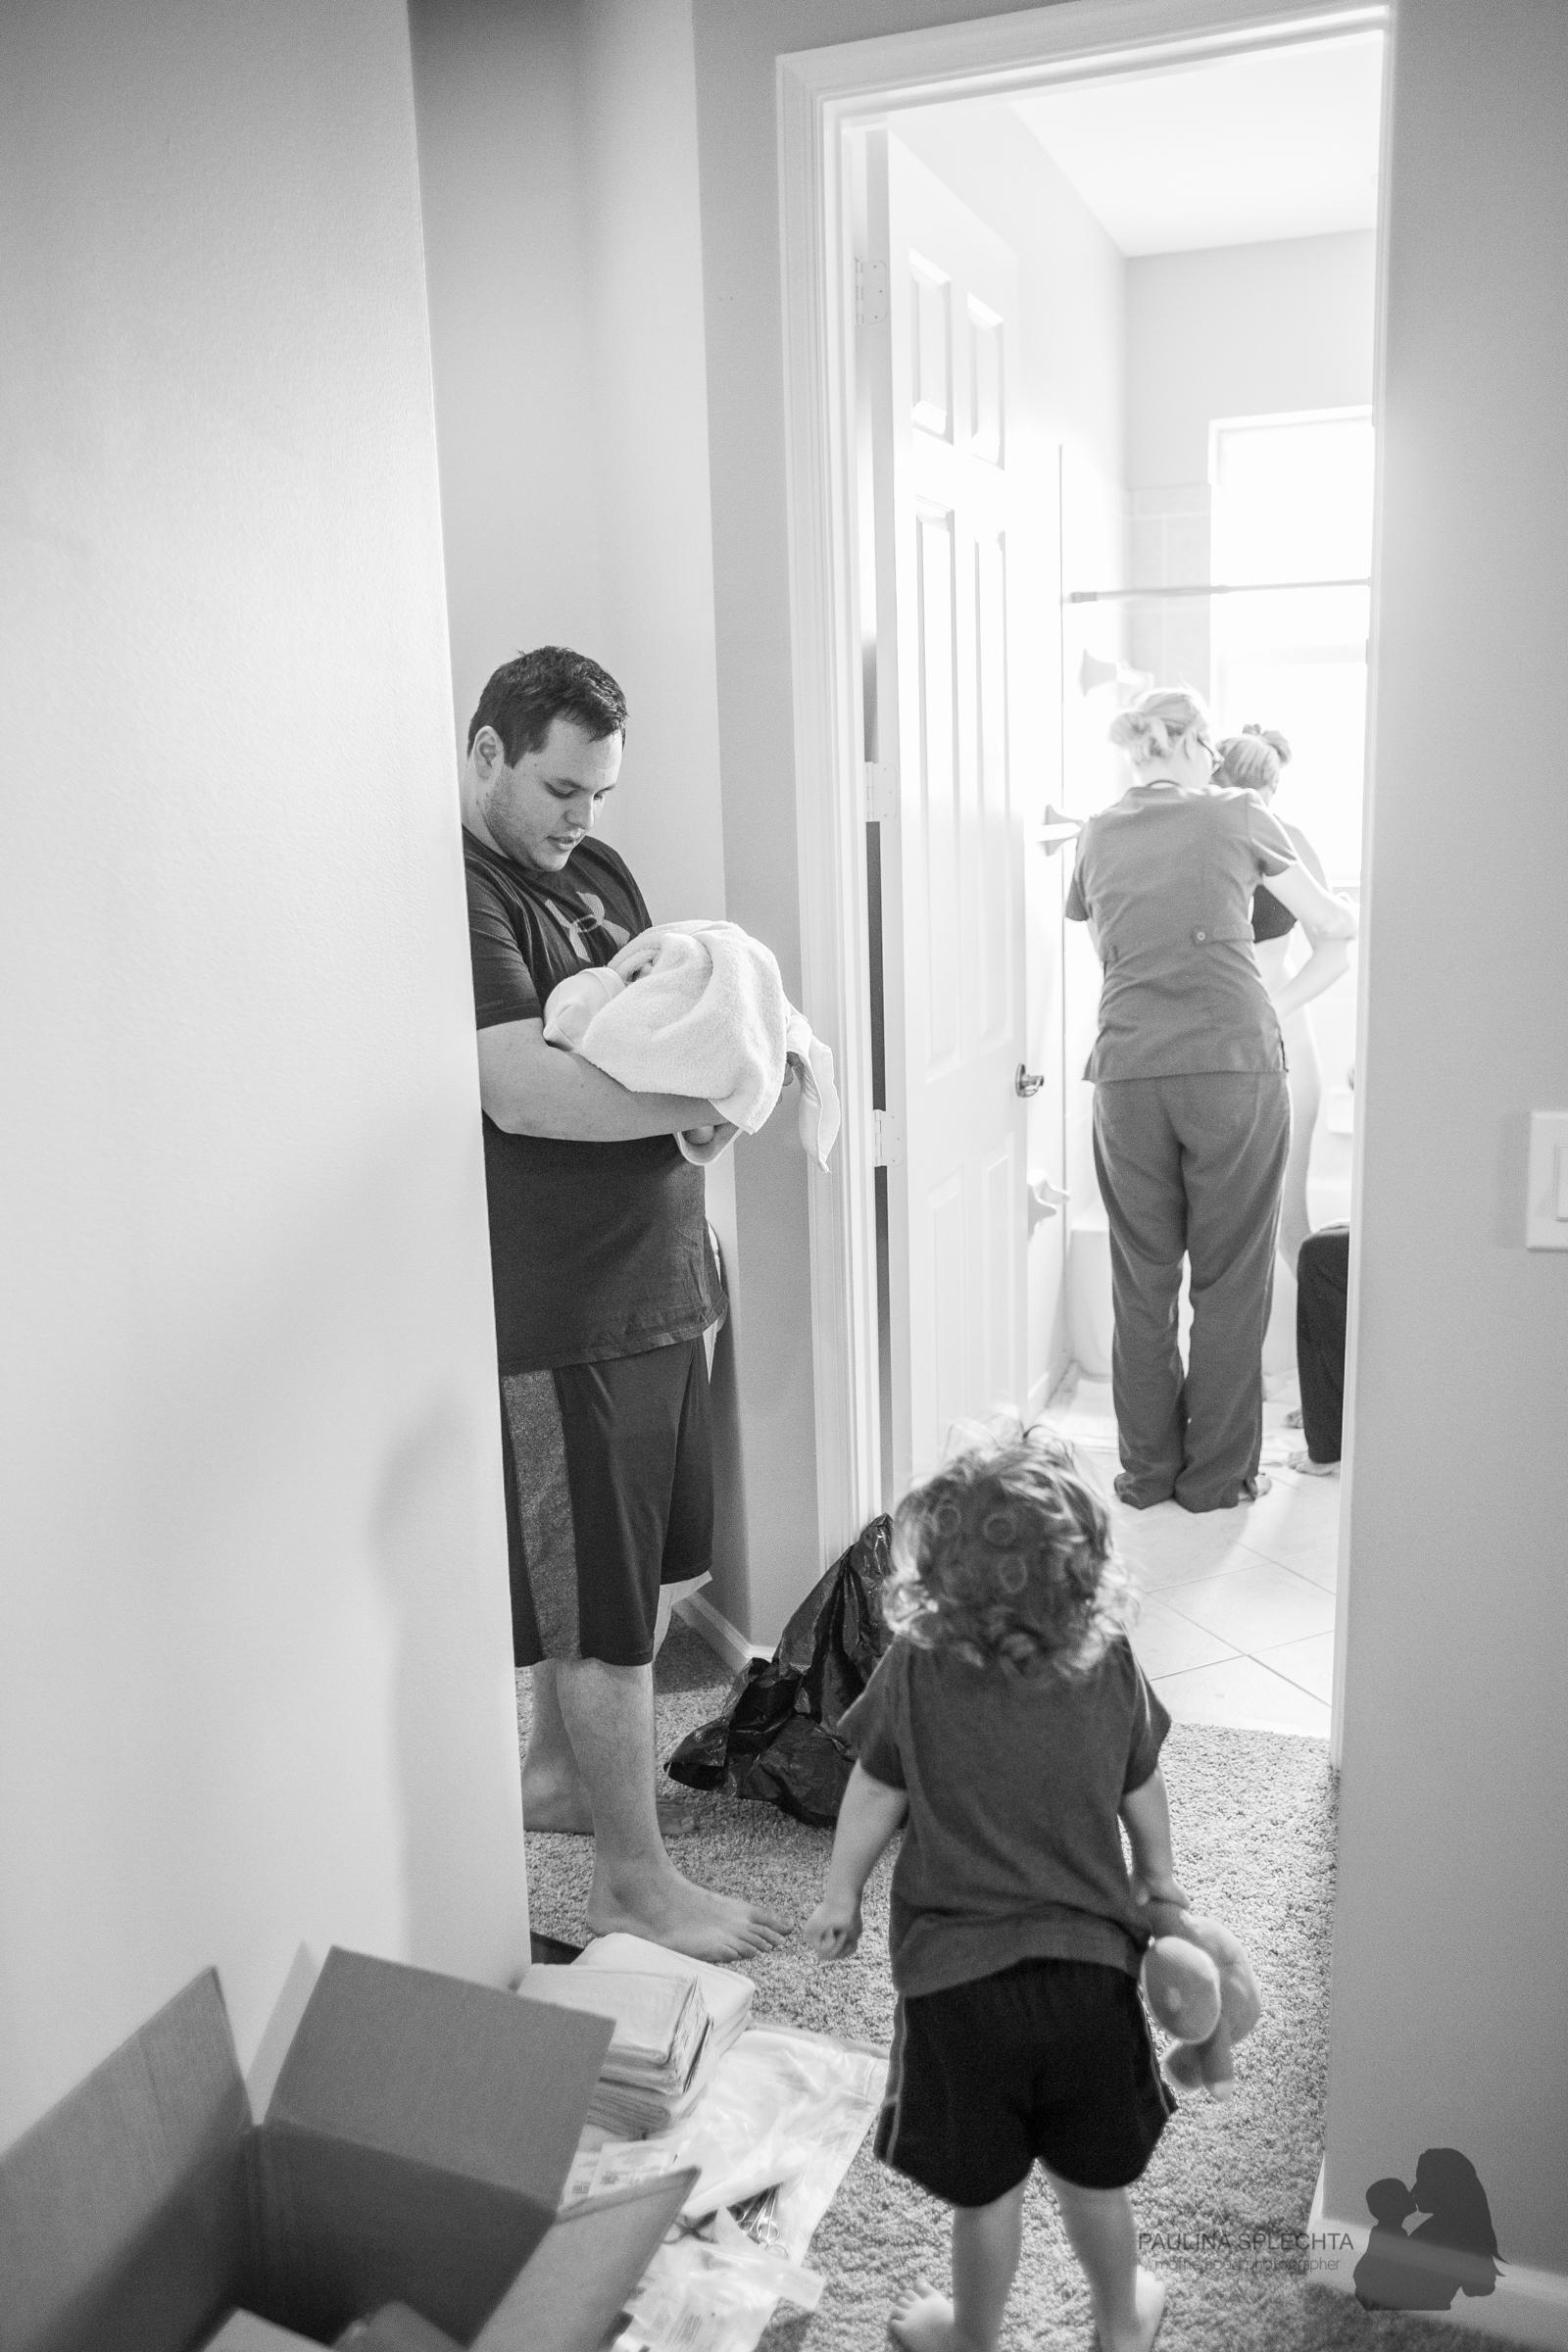 bocabirthphotographer-boca-birth-photographer-birth-center-hospital-hypnobirthing-midwife-doula-trimester-breastfeeding-florida-hollywood-delray-stop-nausea-morning-sickness-24.jpg